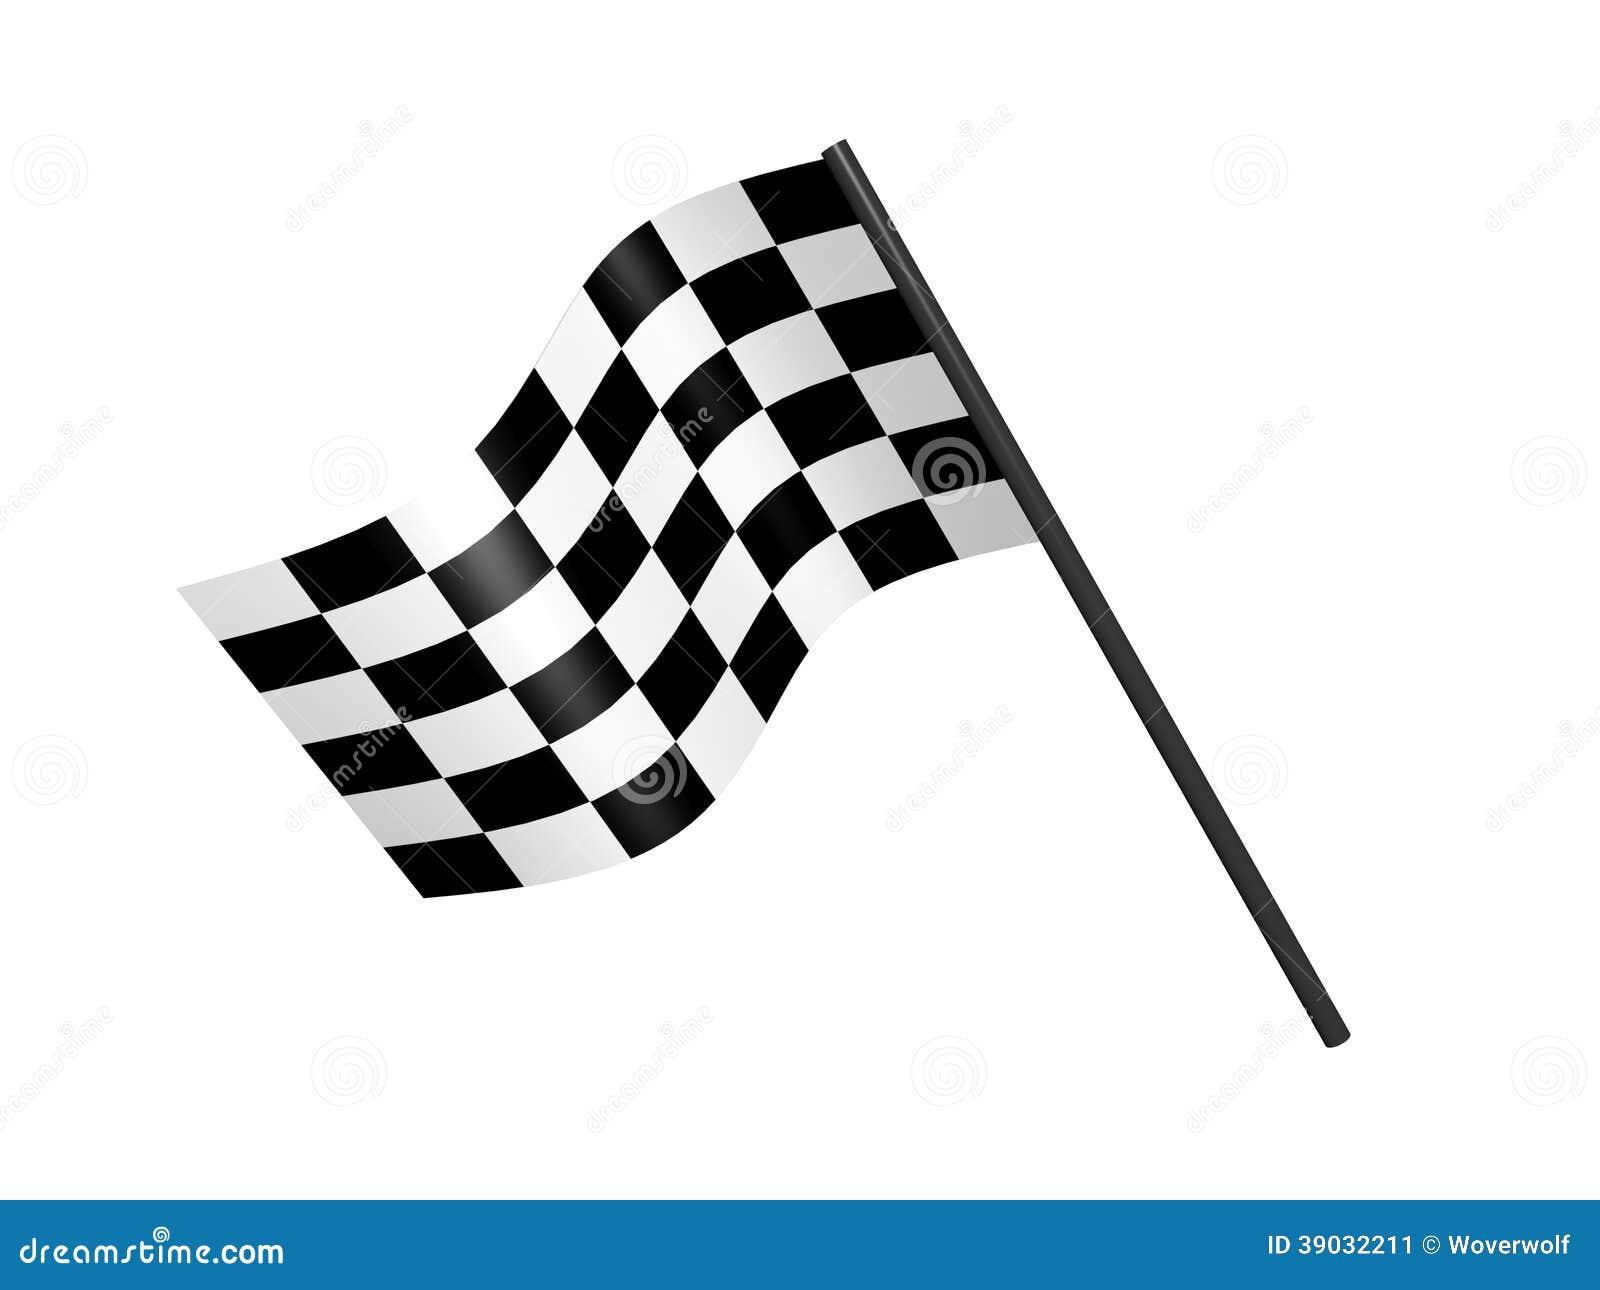 Racing Checkered Flag >> Finish Flag Stock Illustration - Image: 39032211